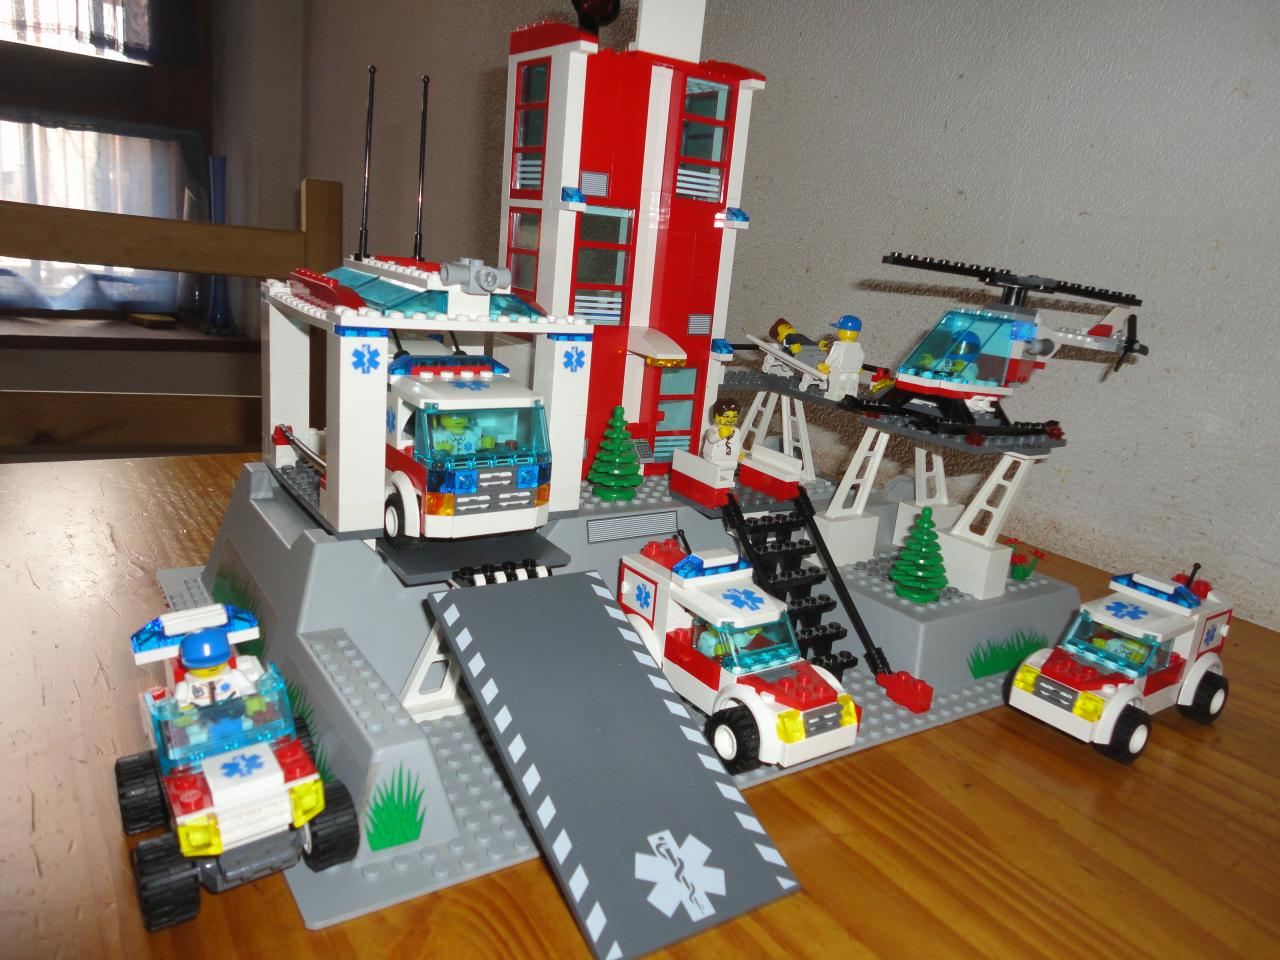 26 avril 2011 l 39 h pital 7892 - Lego city a colorier ...